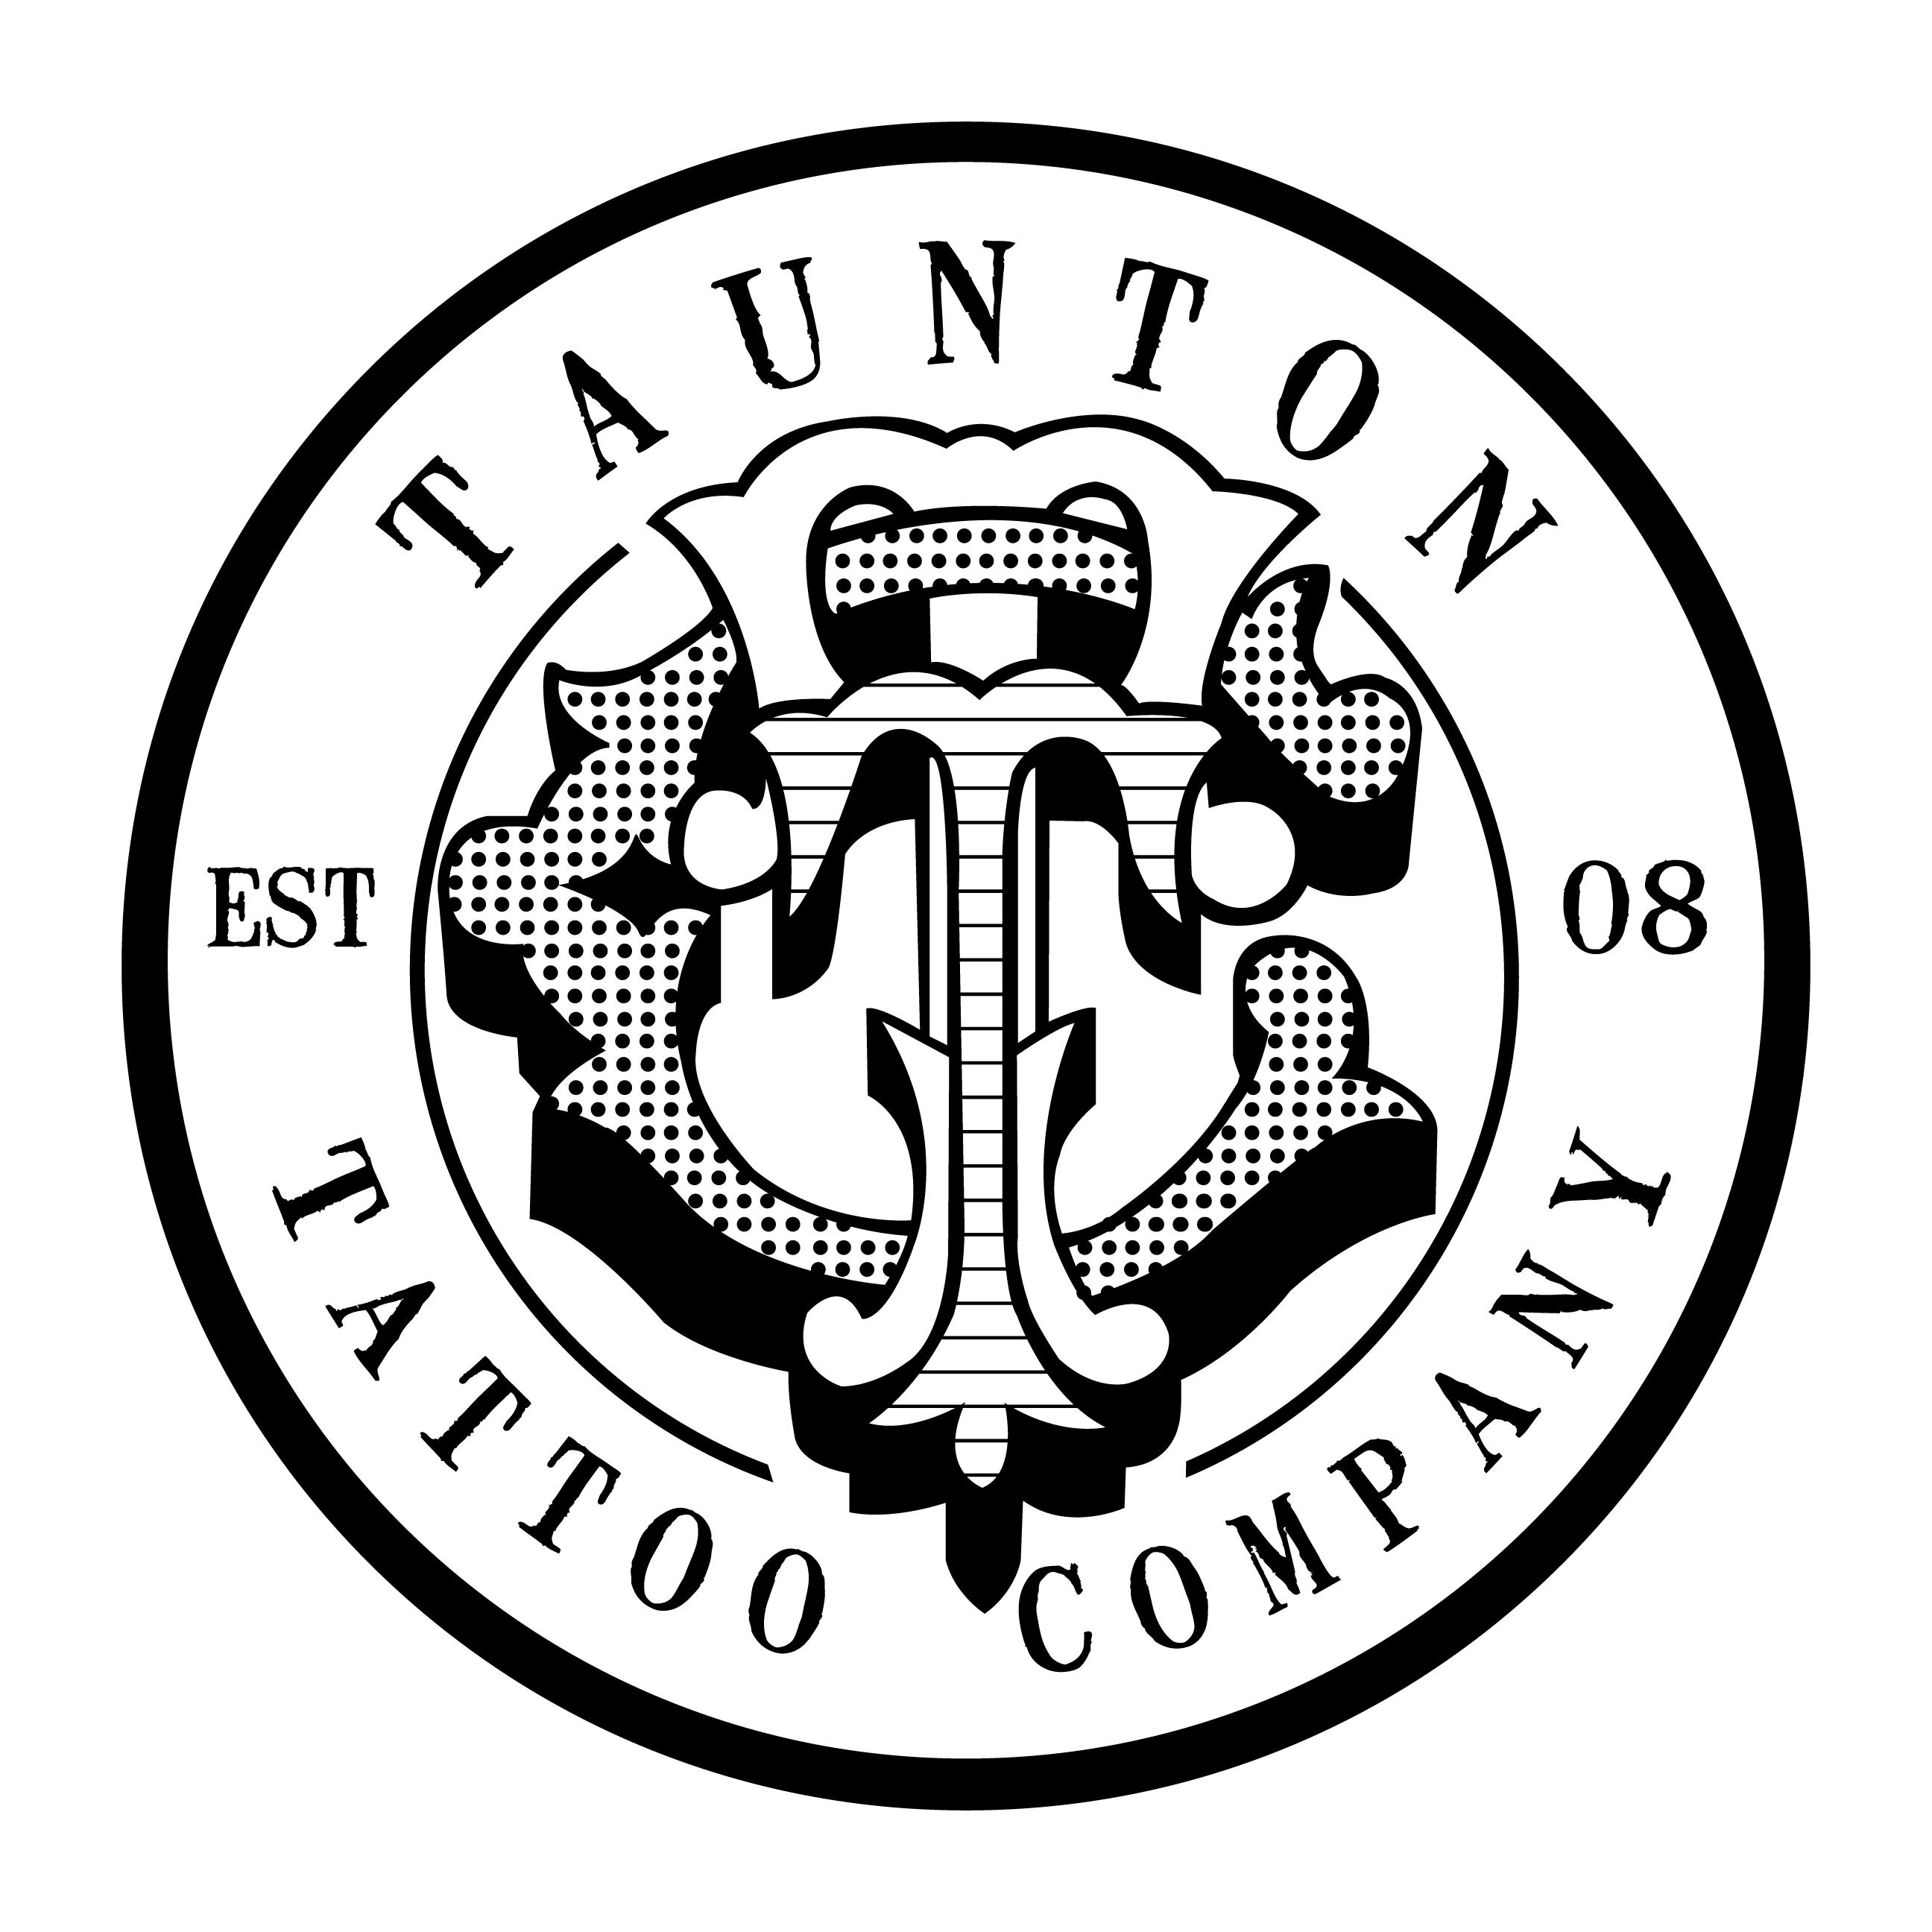 Taunton Tattoo Company